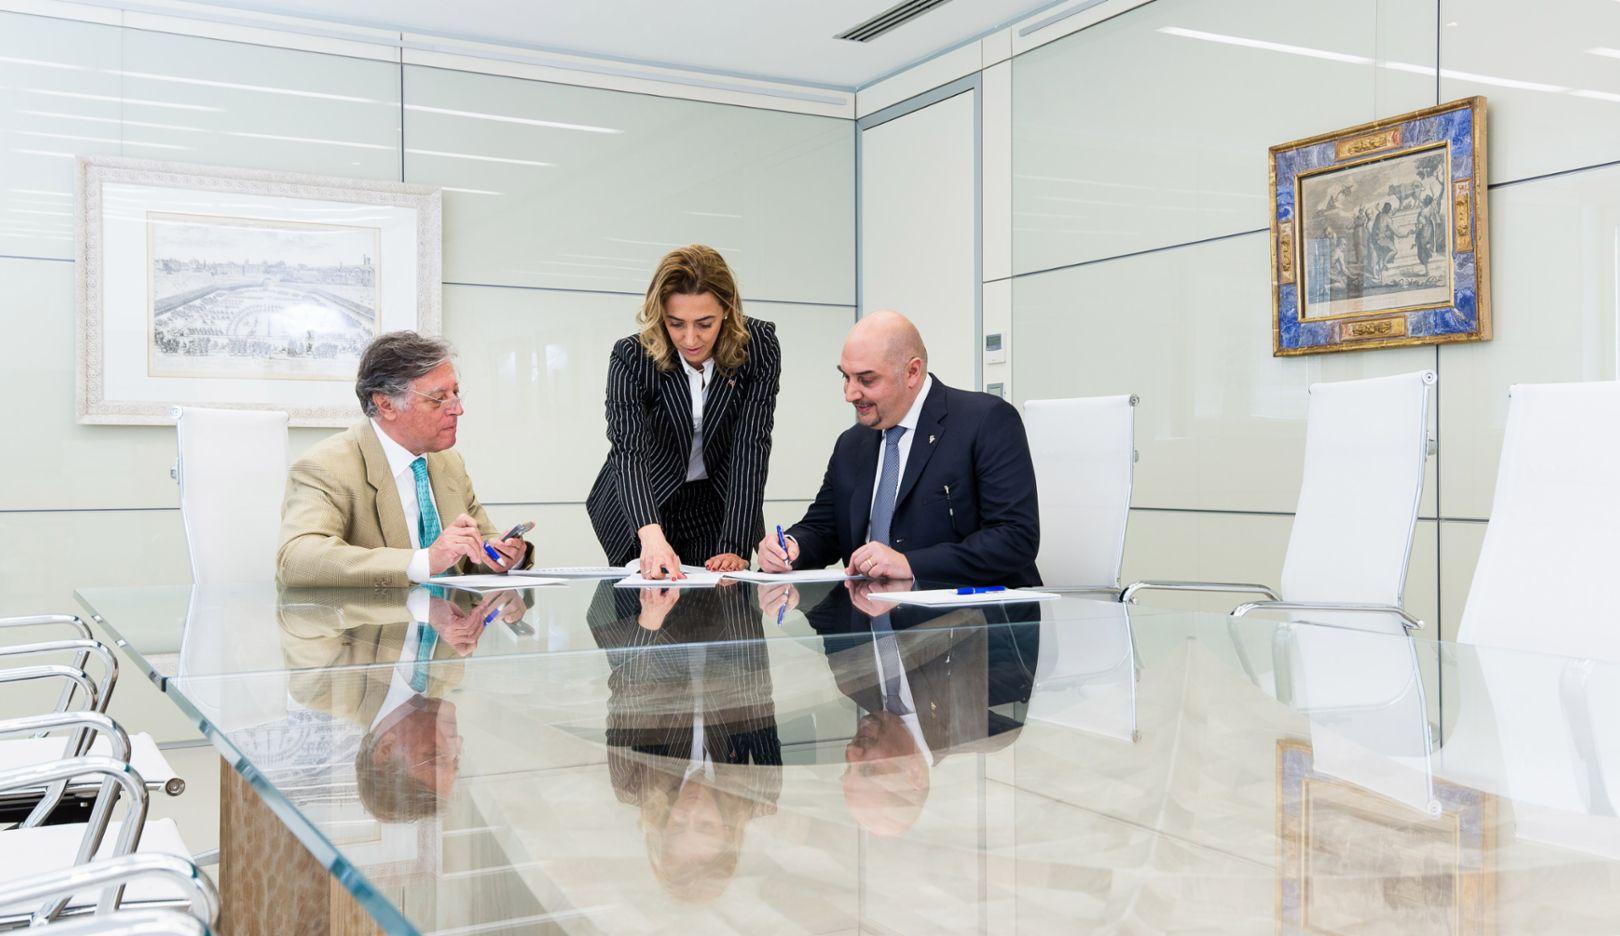 Alfredo Aureli, founder of the Aetna Group, Valentina Aureli, CEO of the Aetna Group, Enrico Aureli, CEO of the Aetna Group, l-r, 2016, Porsche Consulting GmbH